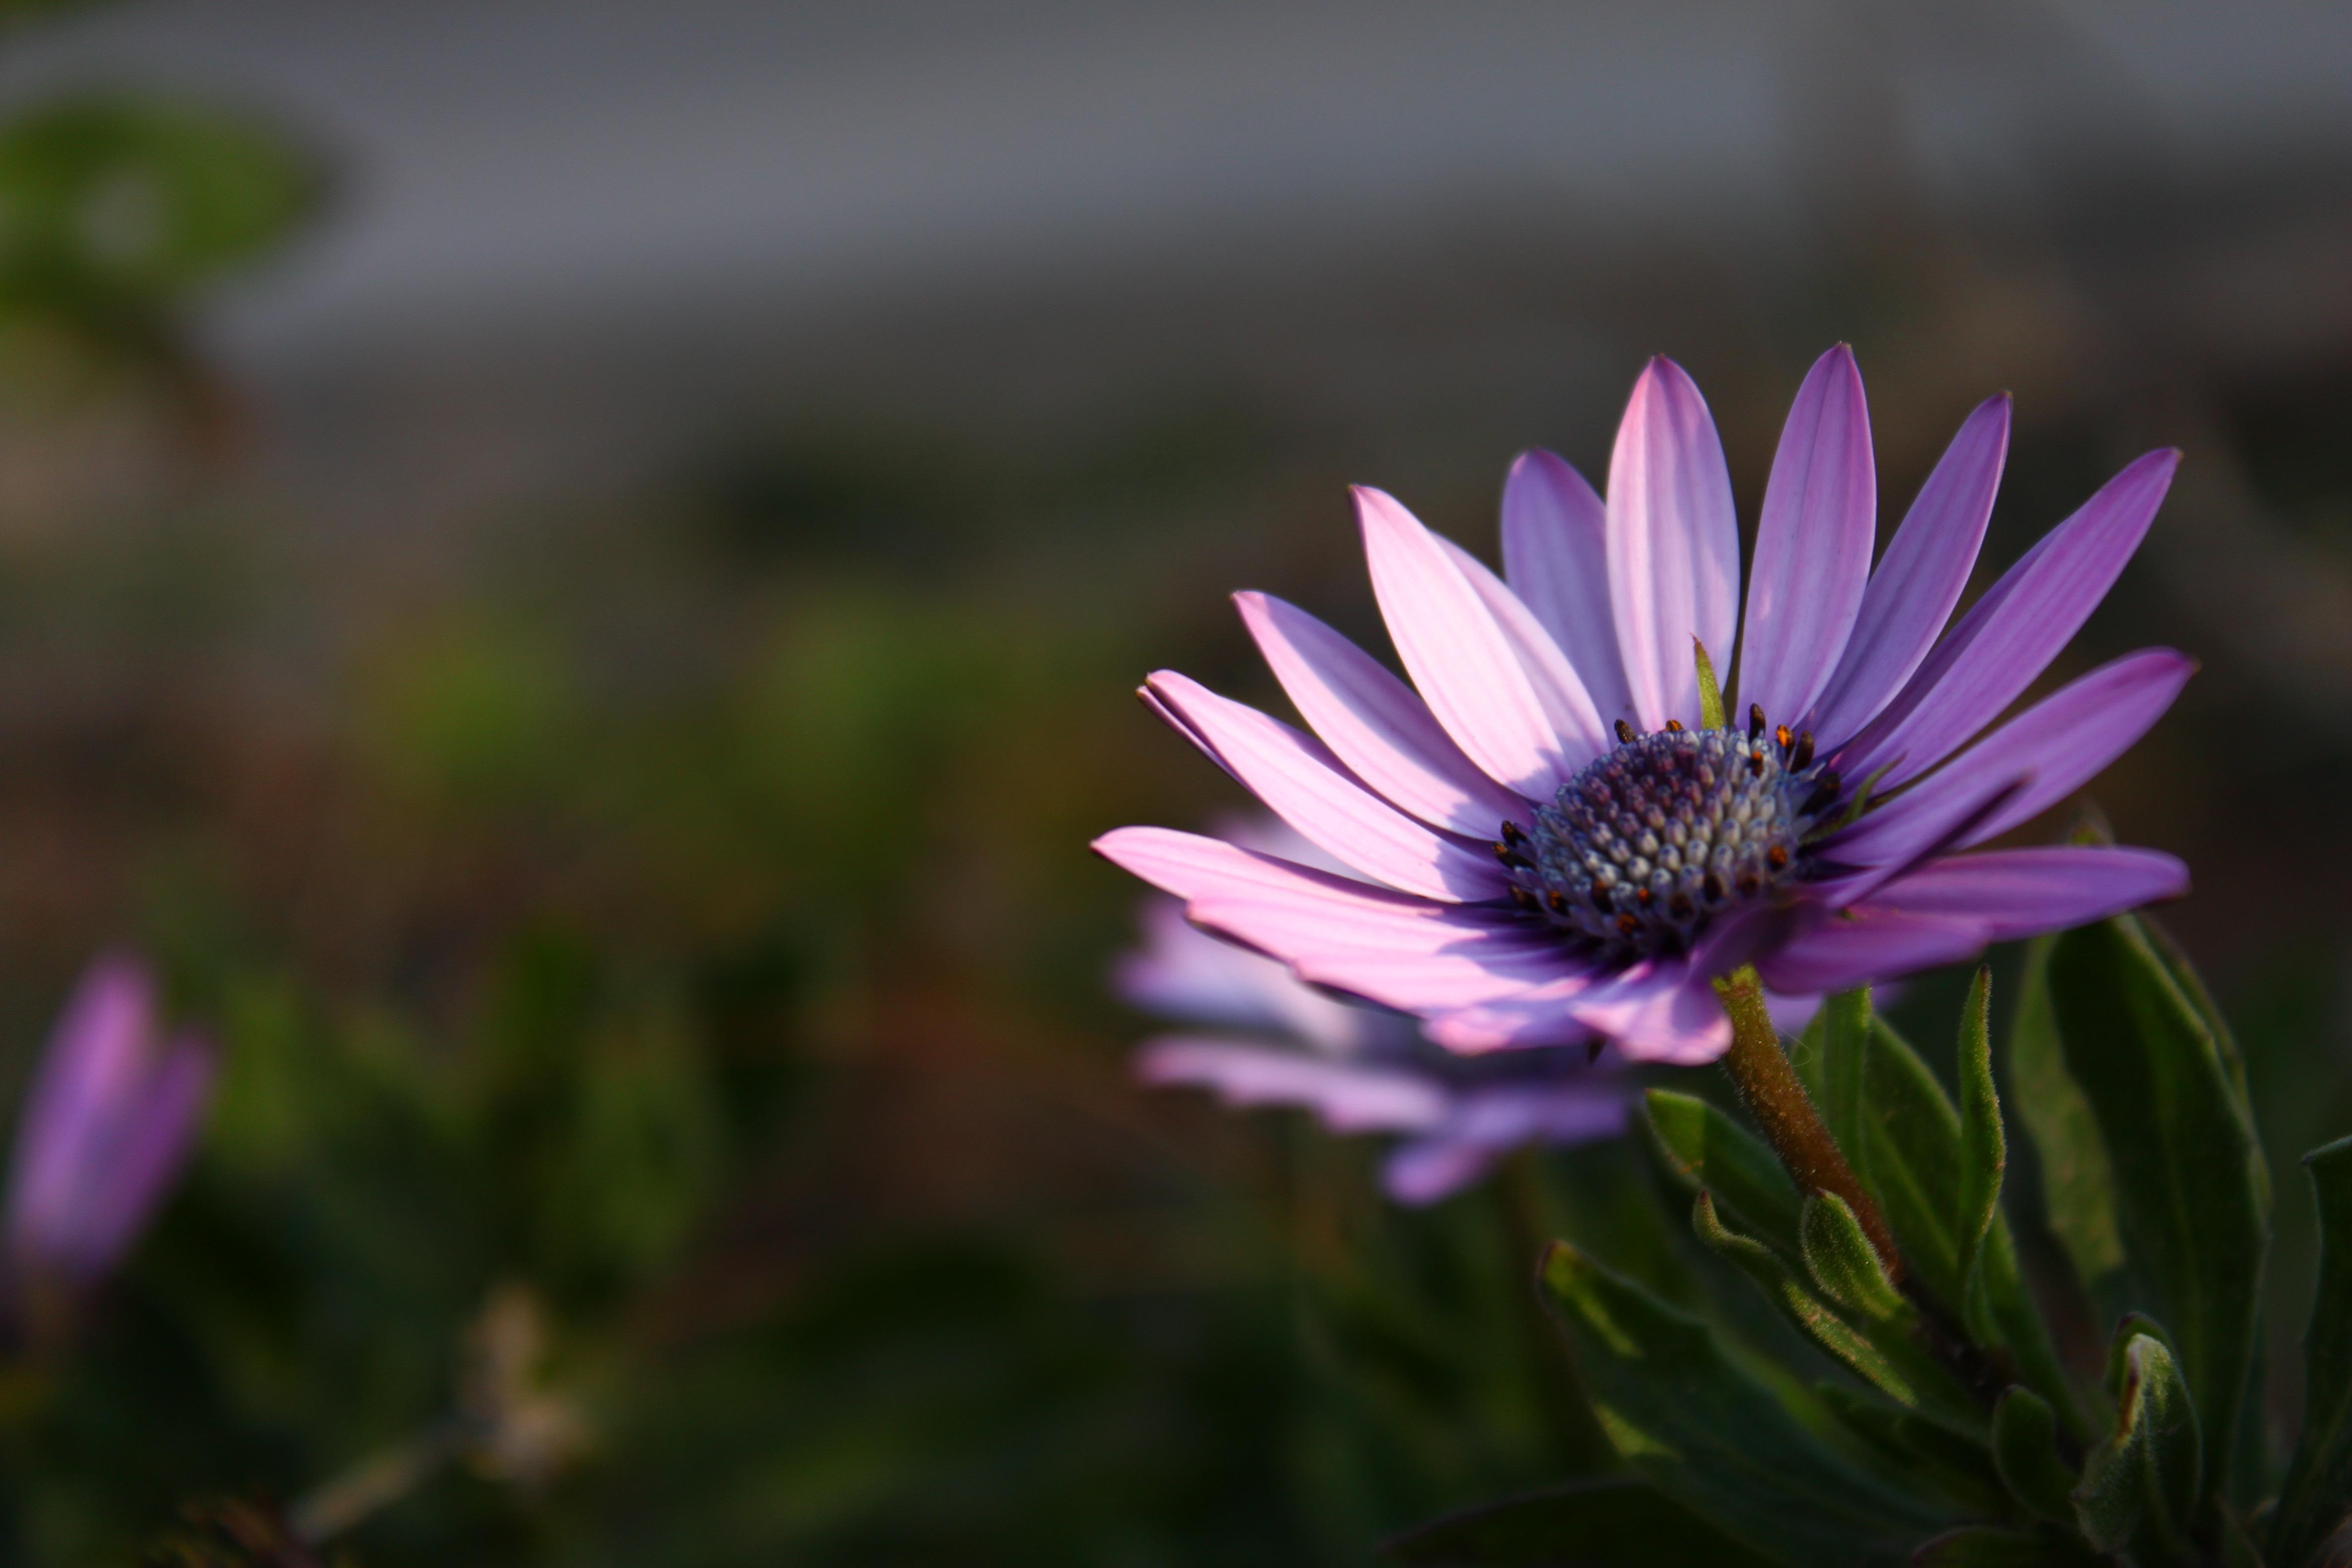 HD Violet Flower - HD Wallpaper Download